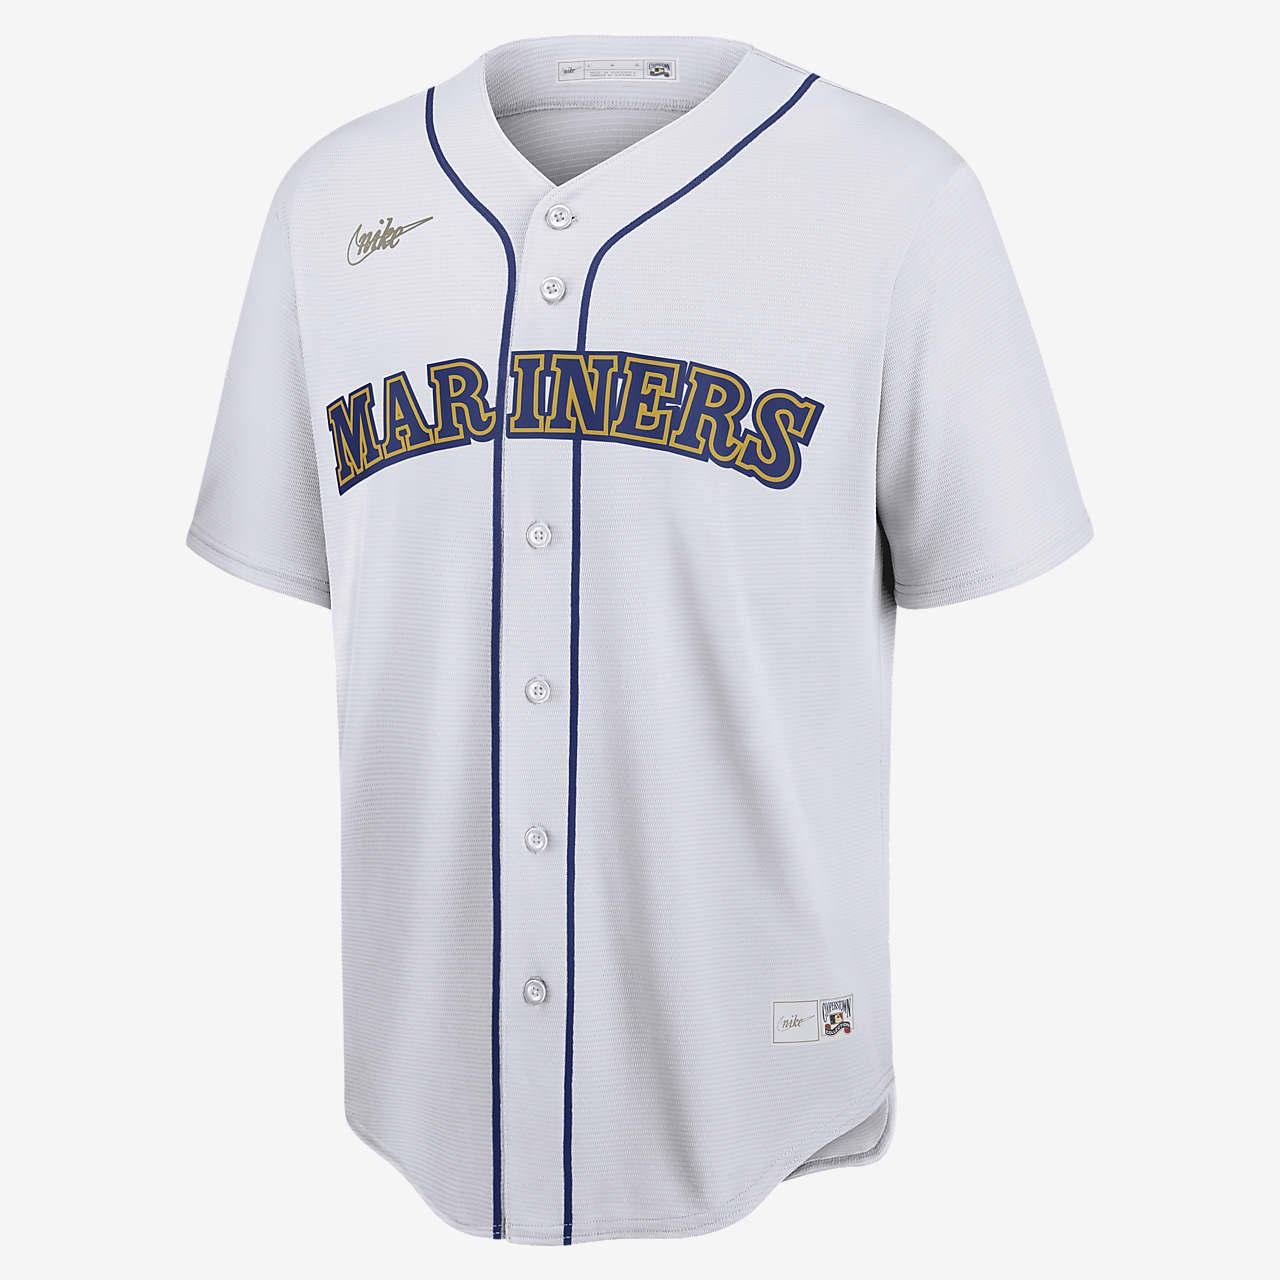 MLB Seattle Mariners (Edgar Martinez) Men's Cooperstown Baseball Jersey